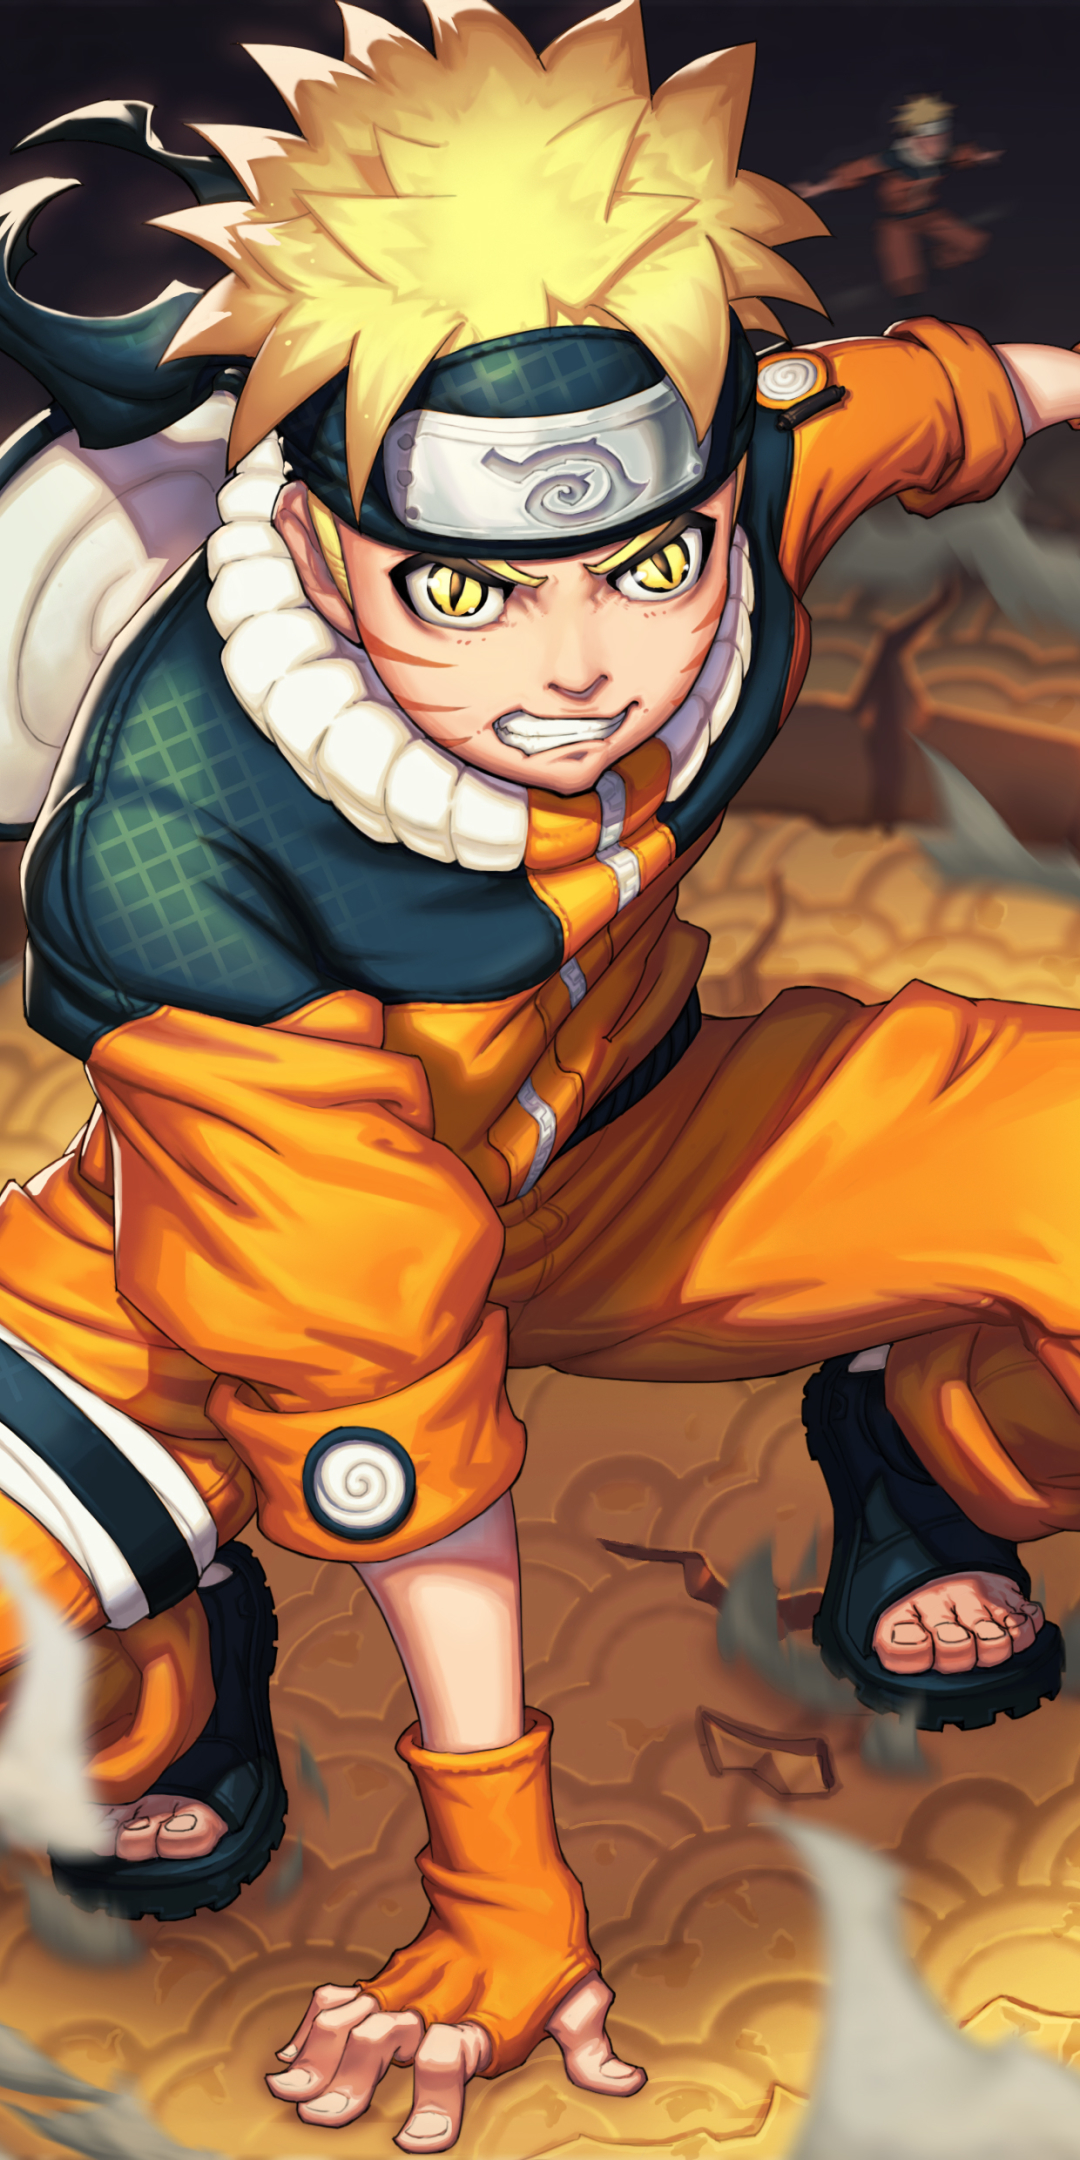 1080x2160 Naruto Uzumaki 4K Art One Plus 5T,Honor 7x,Honor ...